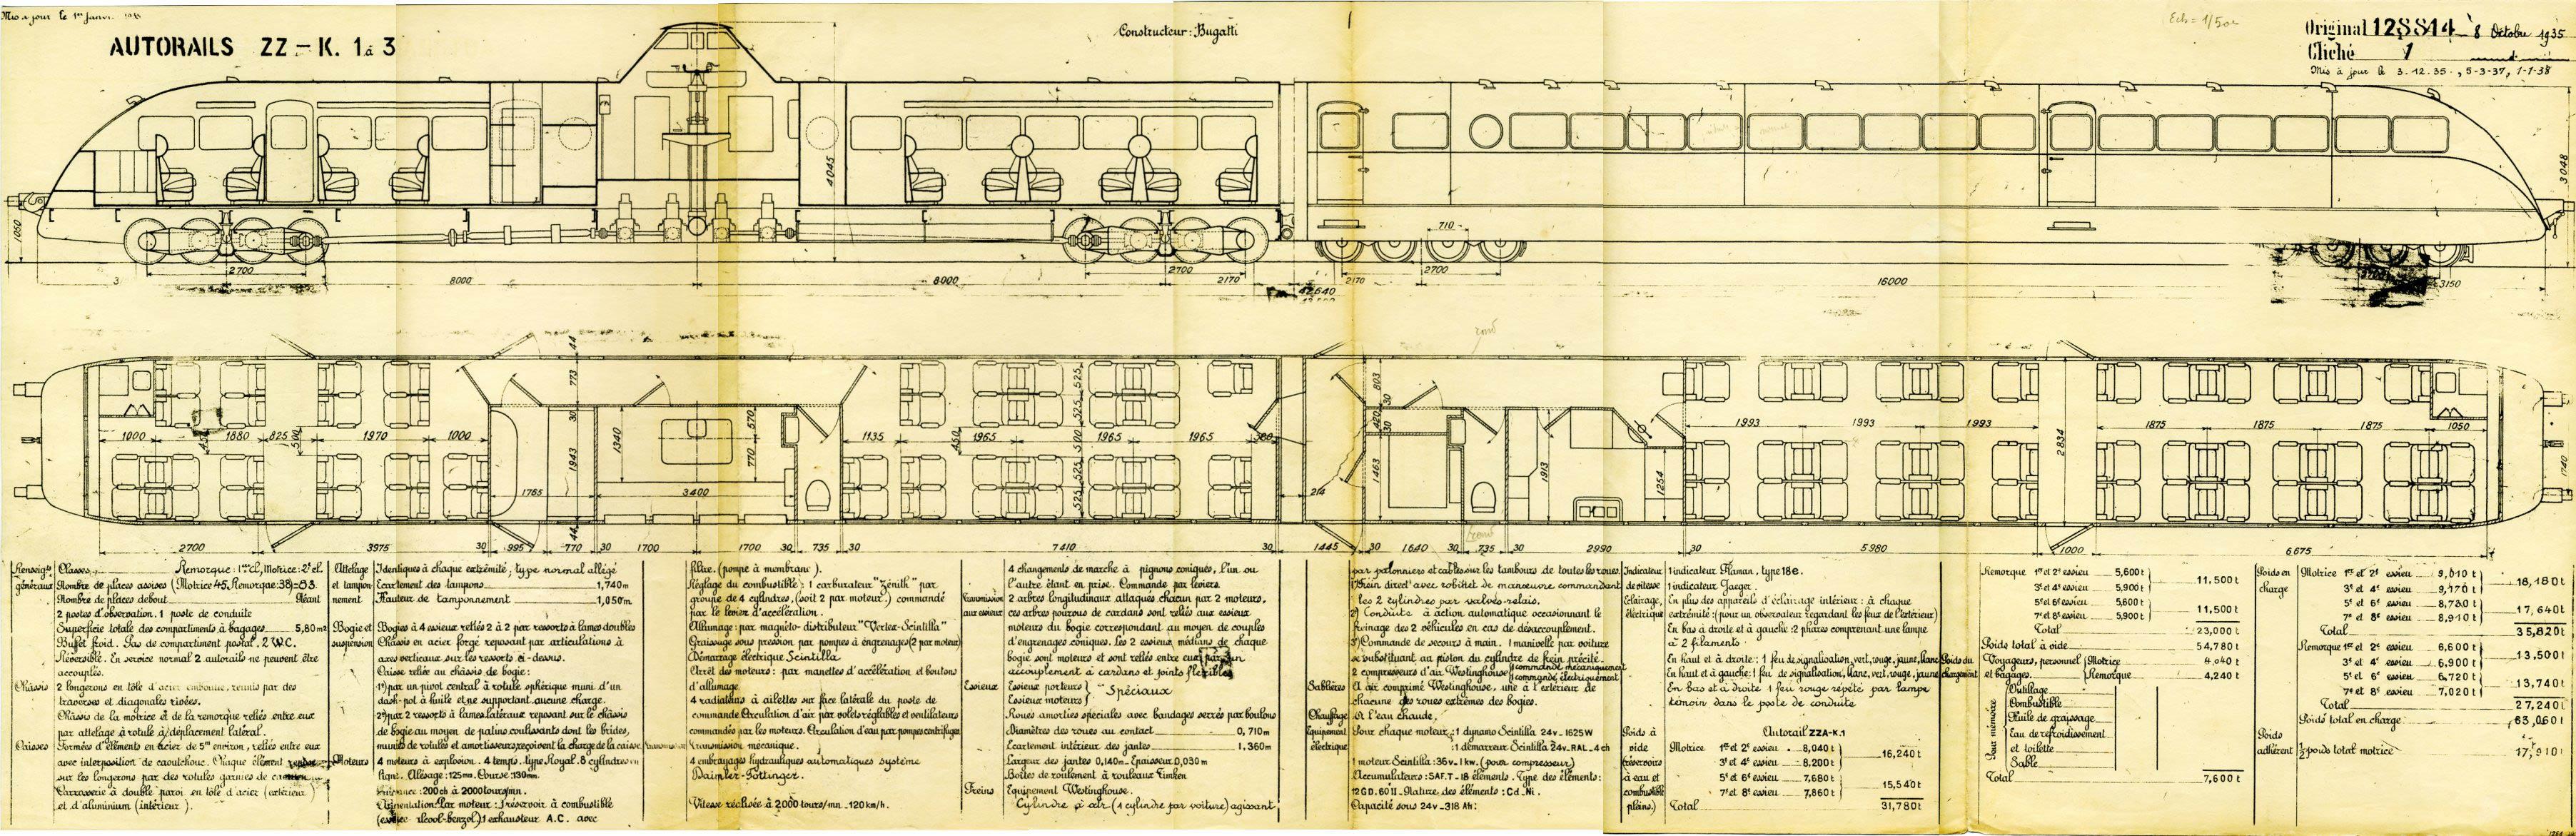 autorails bugatti french railcars of the 1930s retours rh retours eu